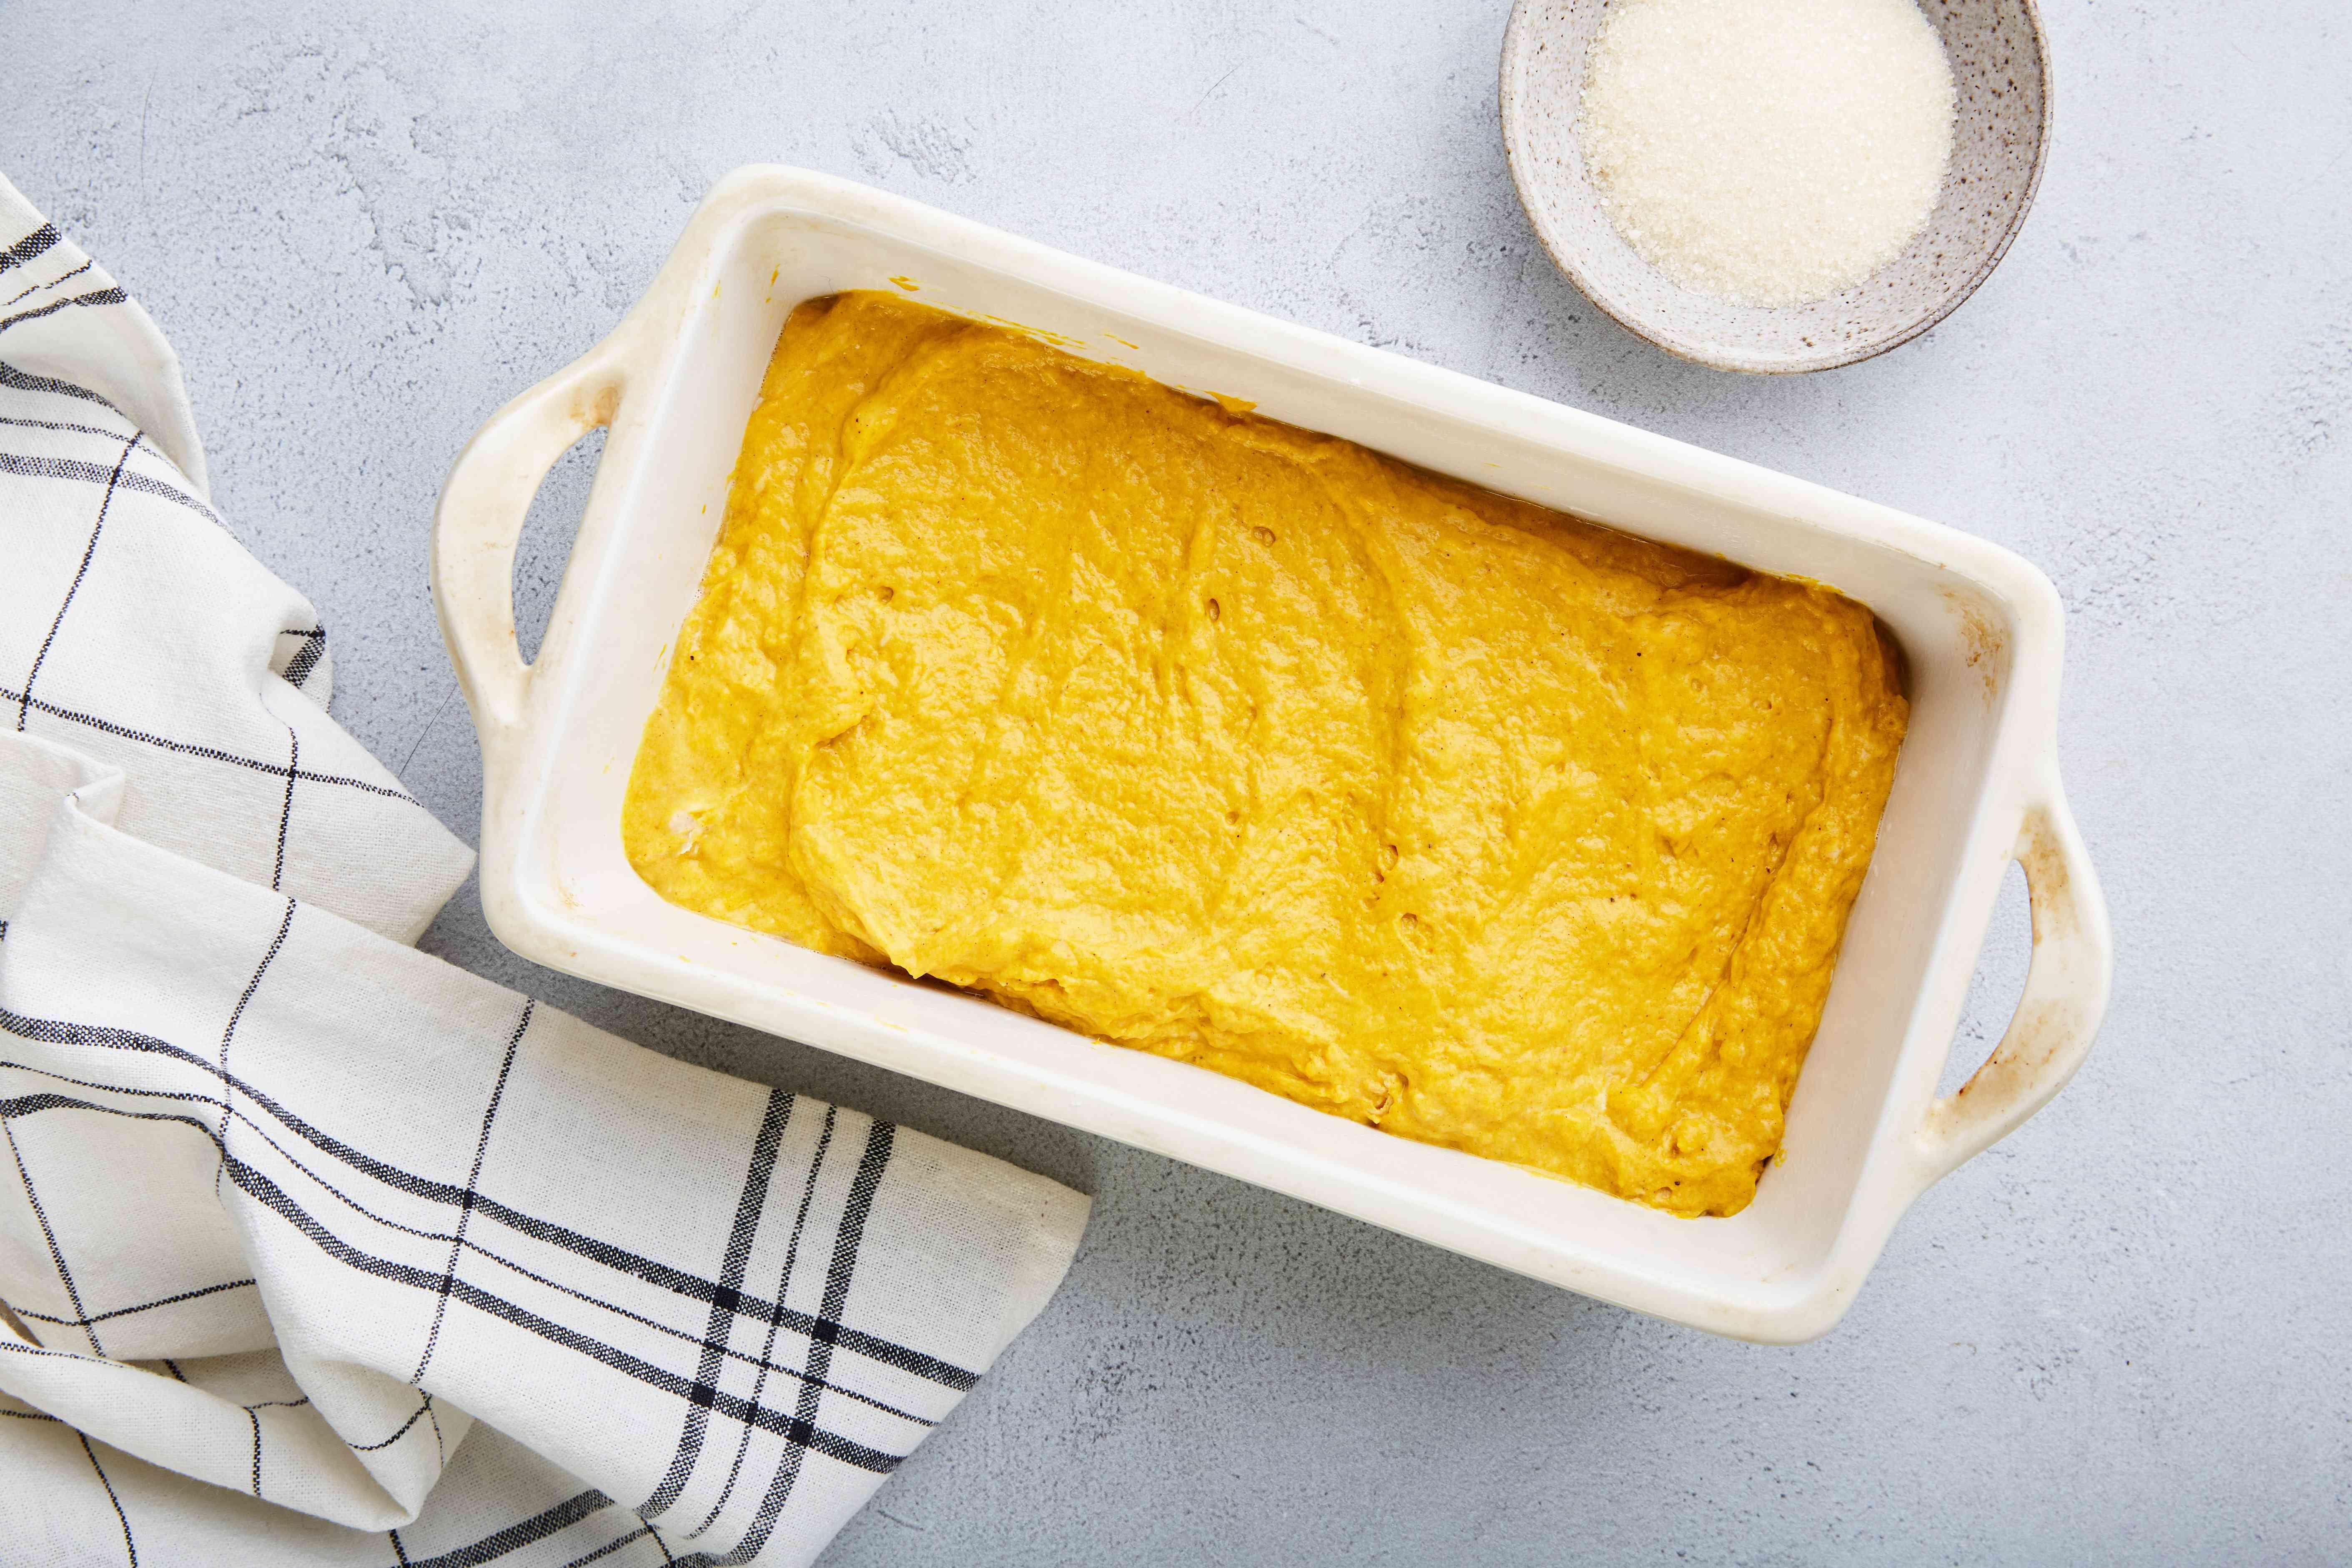 Pour into pan